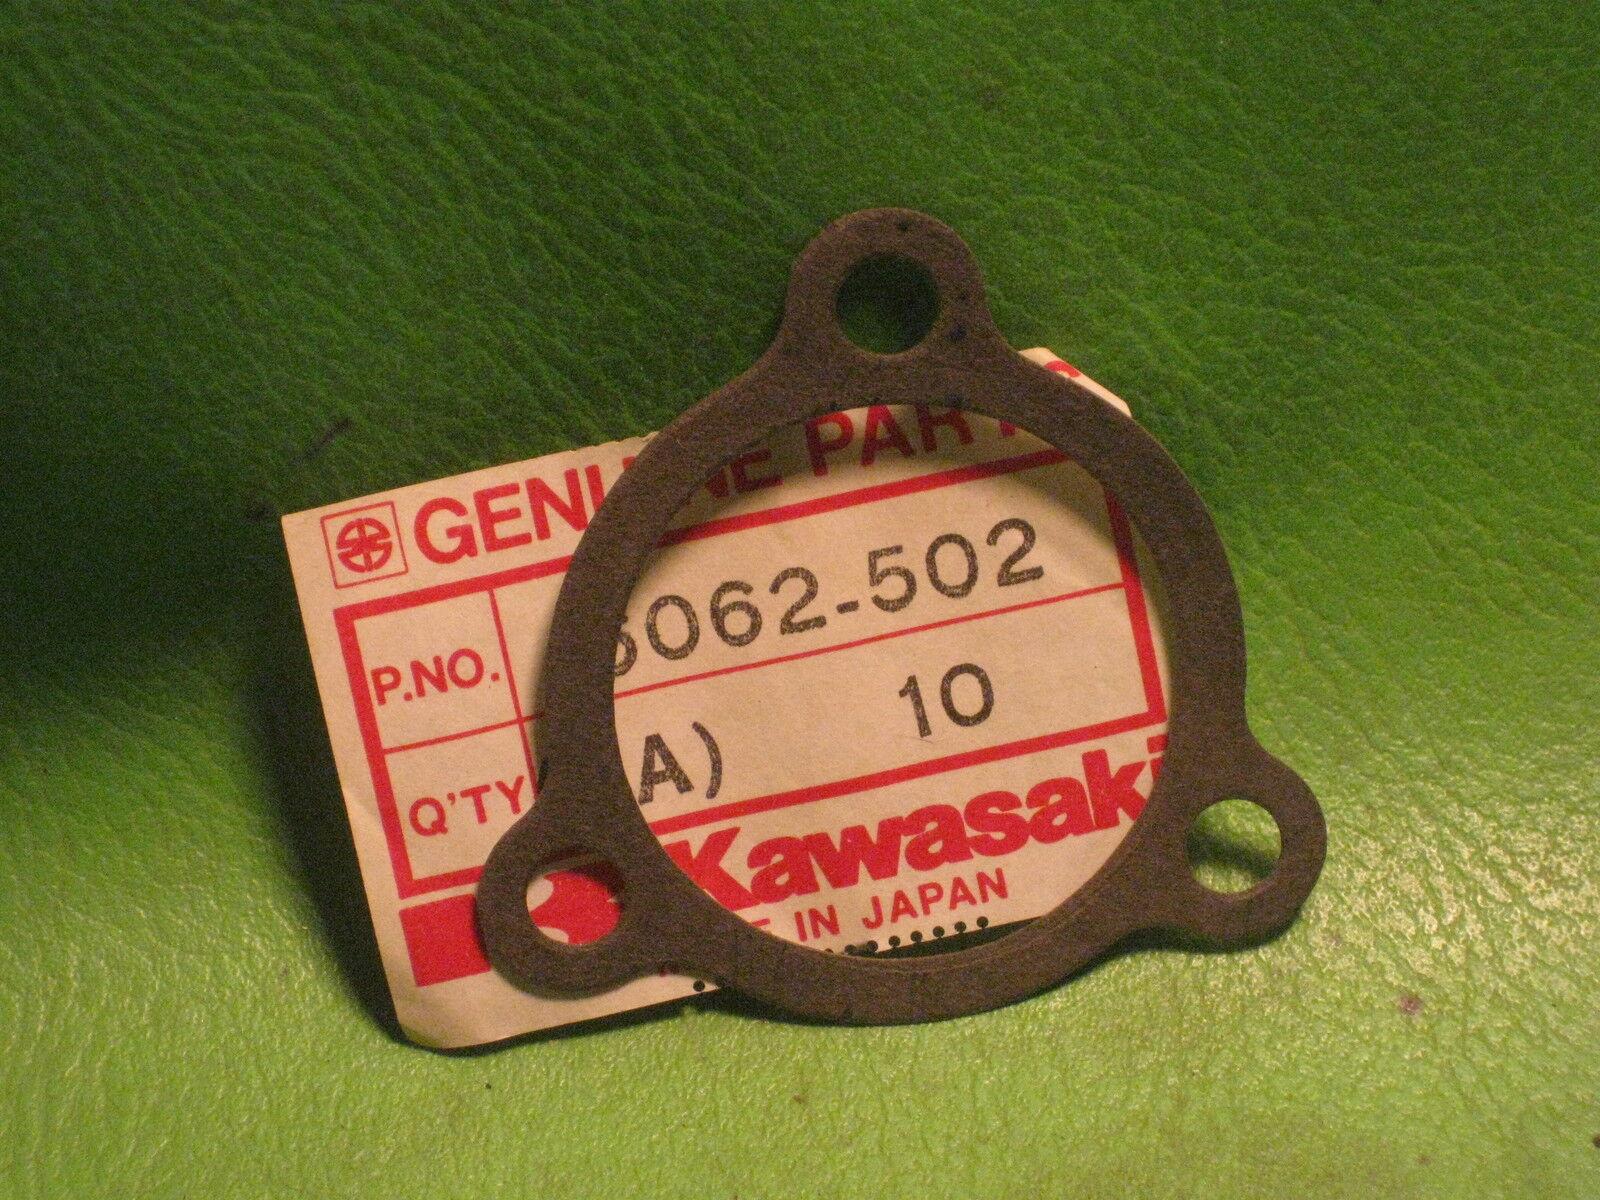 KAWASAKI JS300 JS440 JS550 WSA JET SKI  INTAKE CASE LOWER GASKET OEM#16062-502